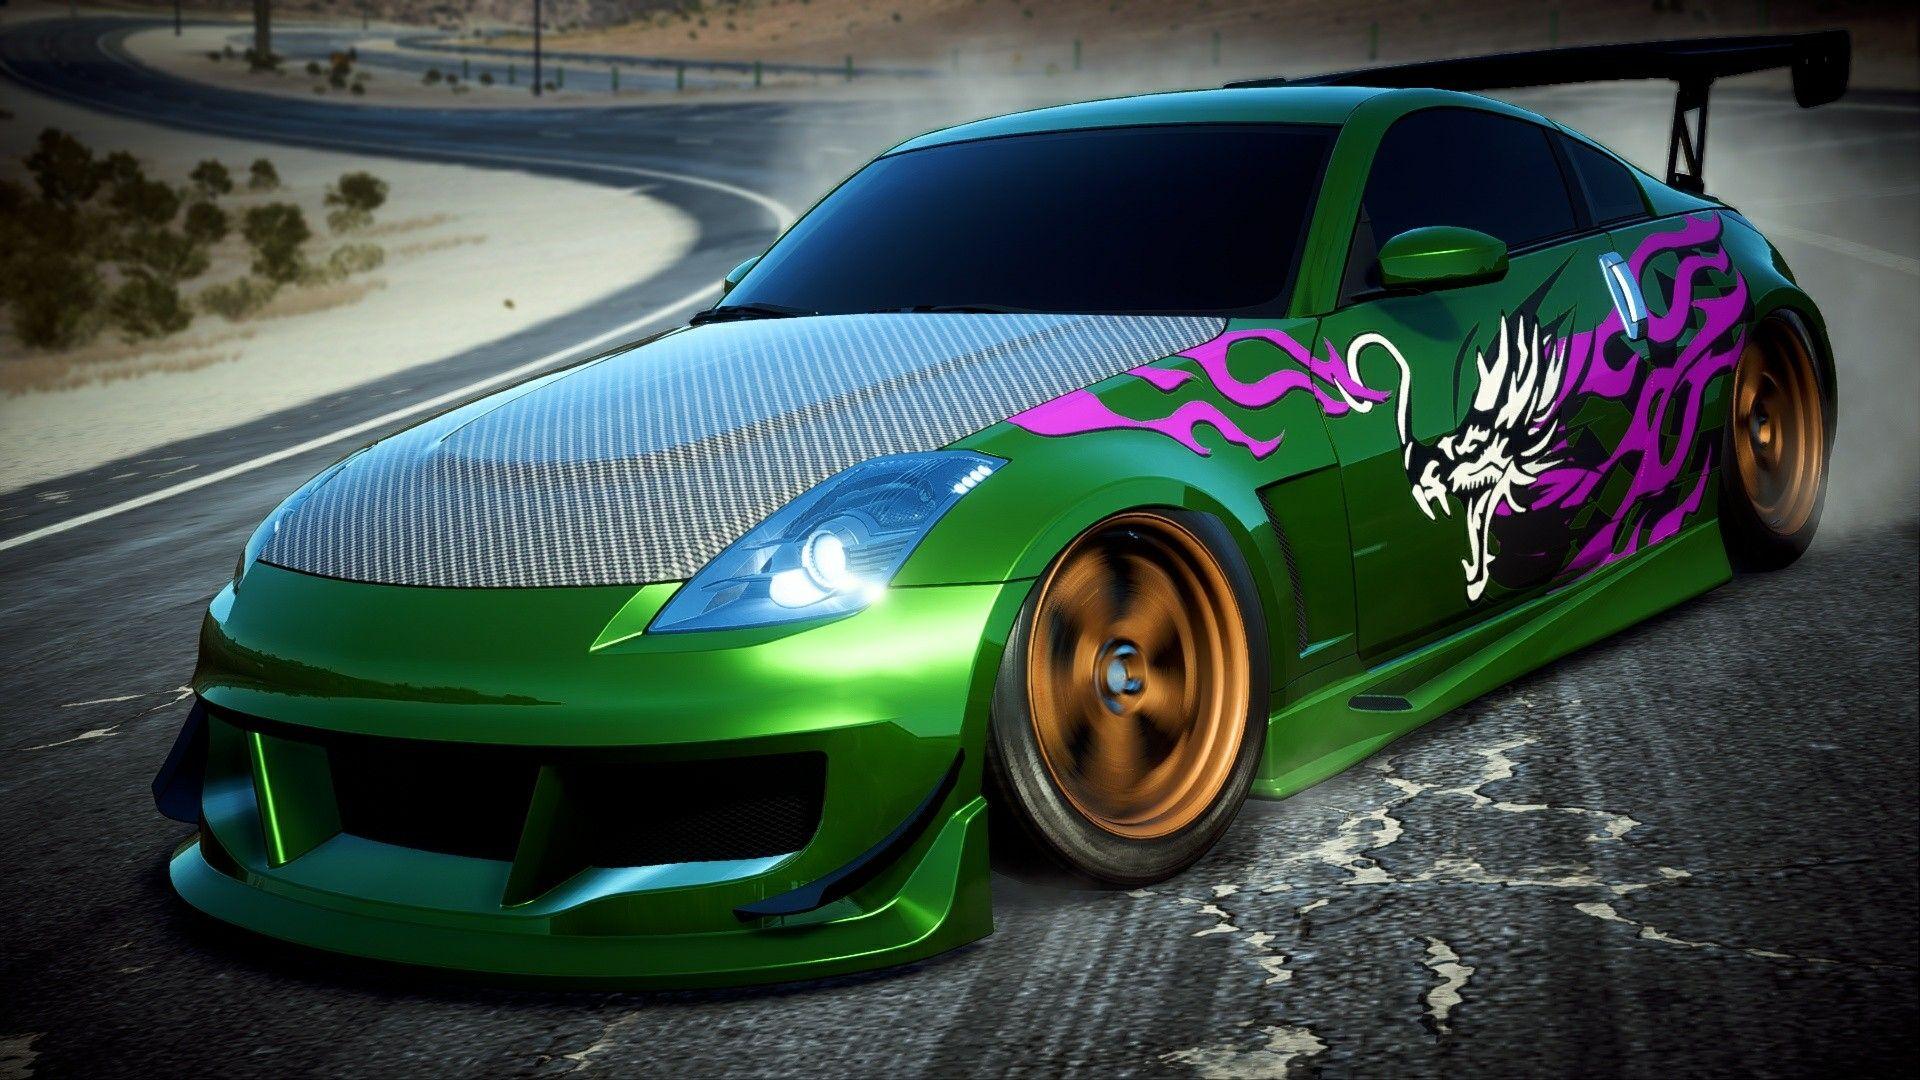 Rachel S Nissan 350z Nfs Underground 2 Need For Speed Payback